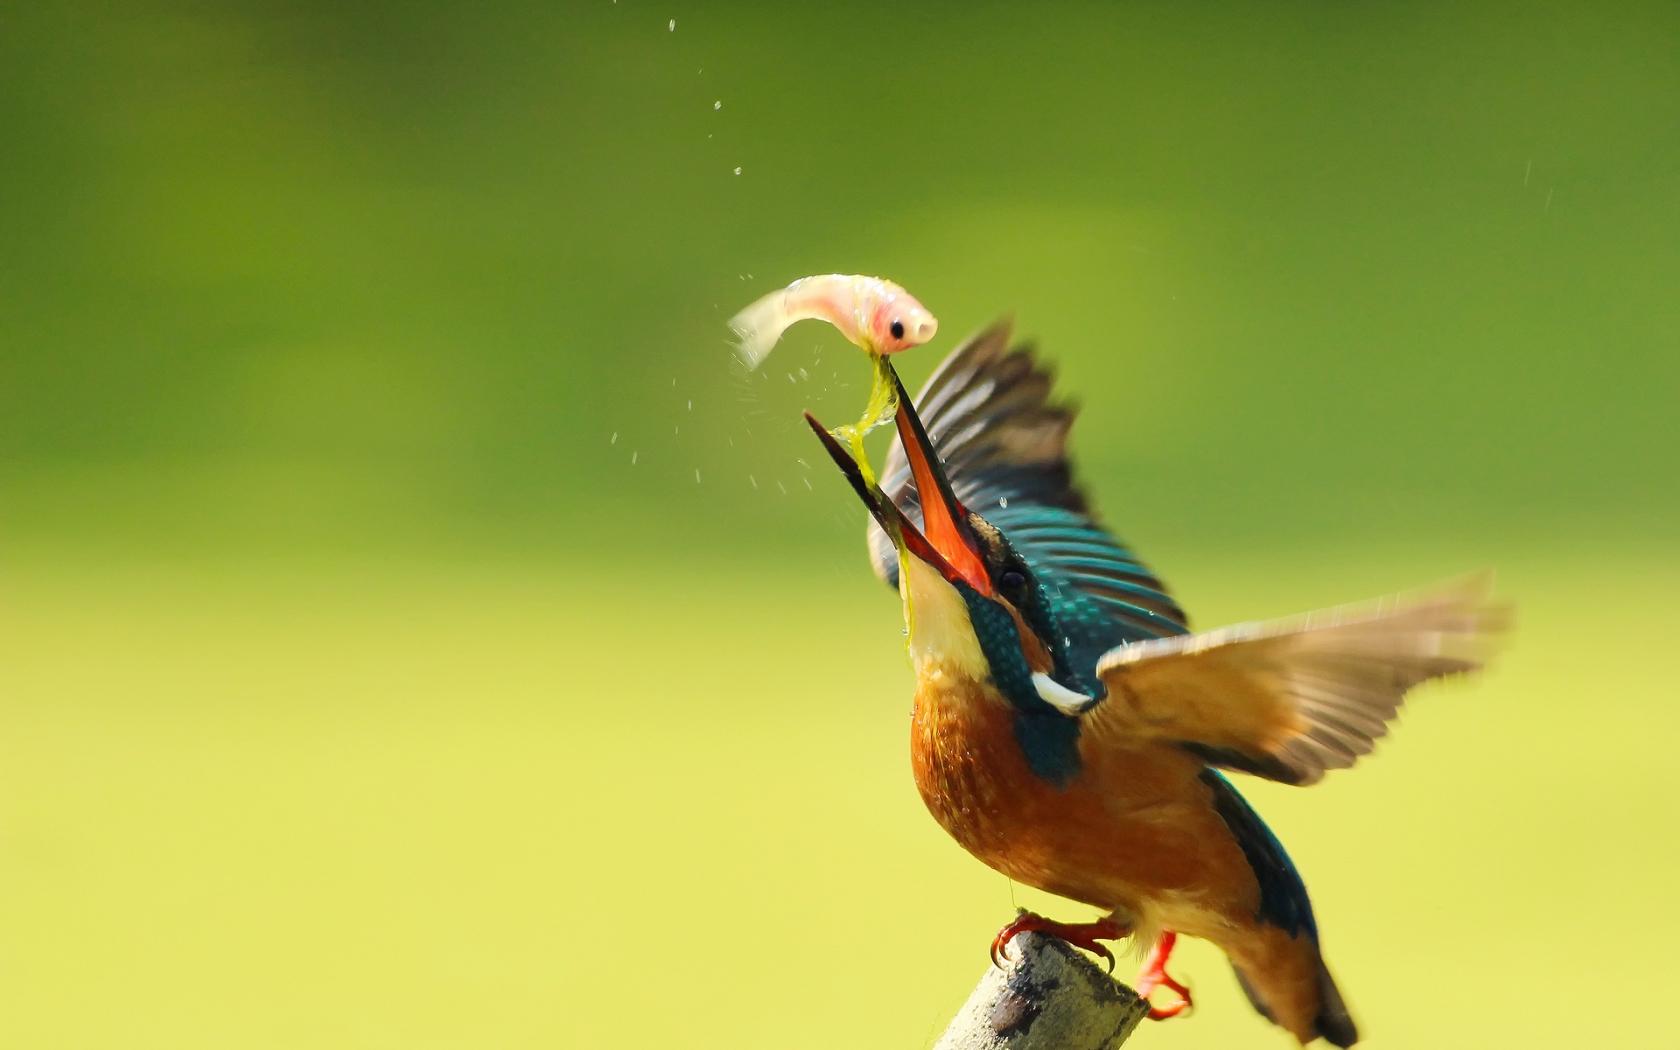 Pájaro pescando - 1680x1050